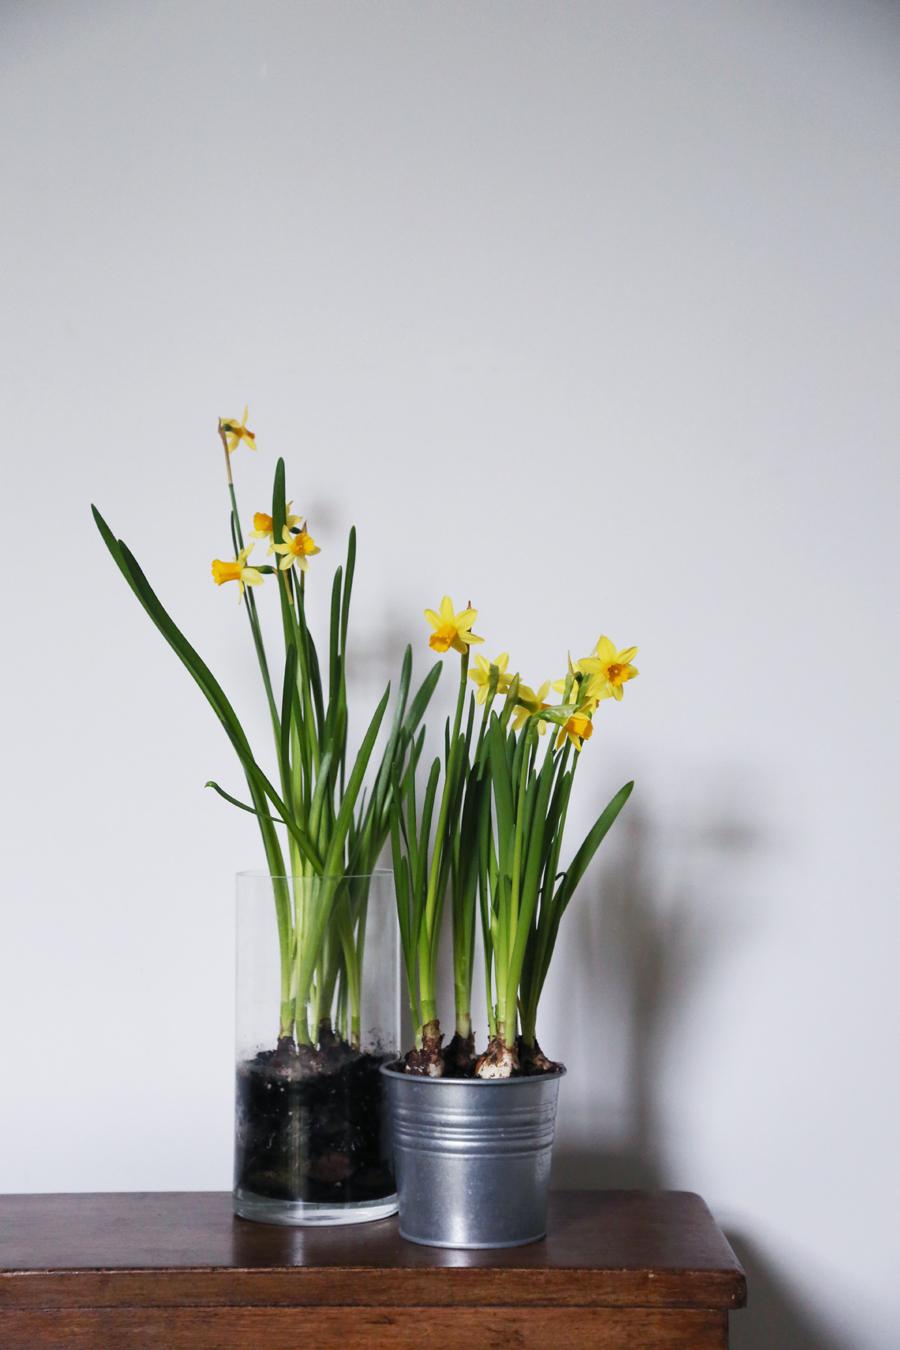 170221-Daffodils.jpg